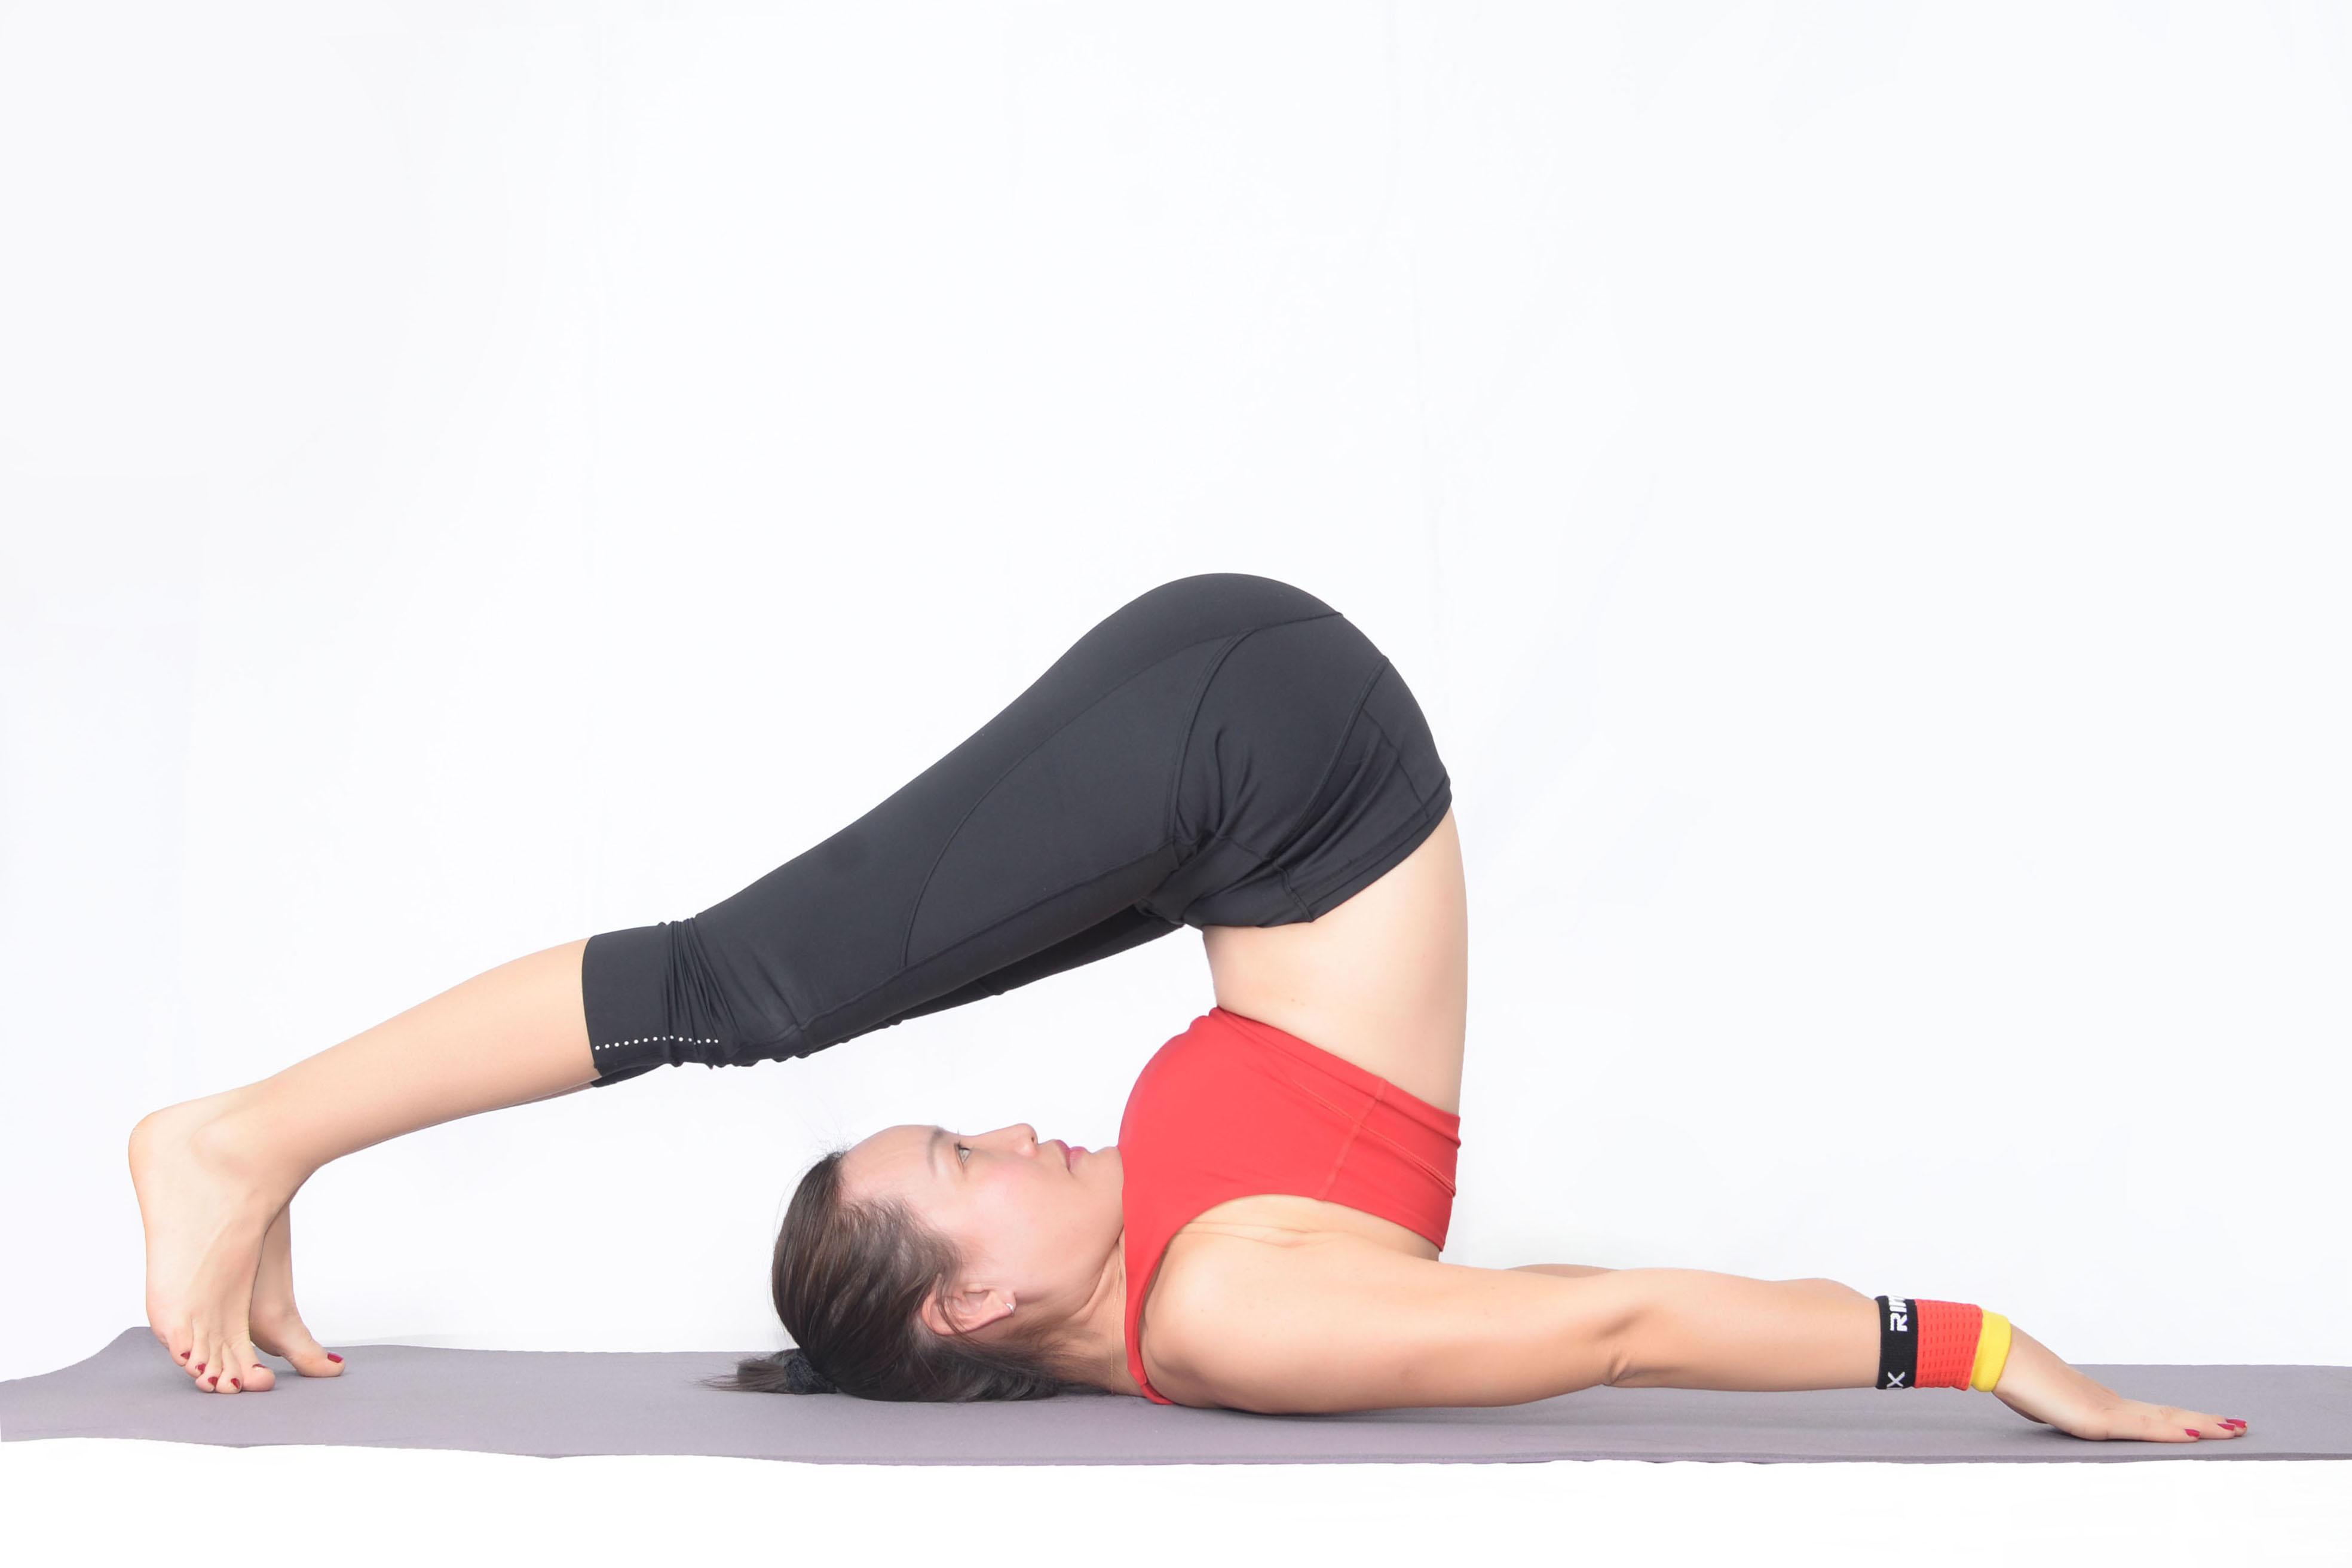 Hatha/General Yoga By Nishimura (Sarah) Yoshimi